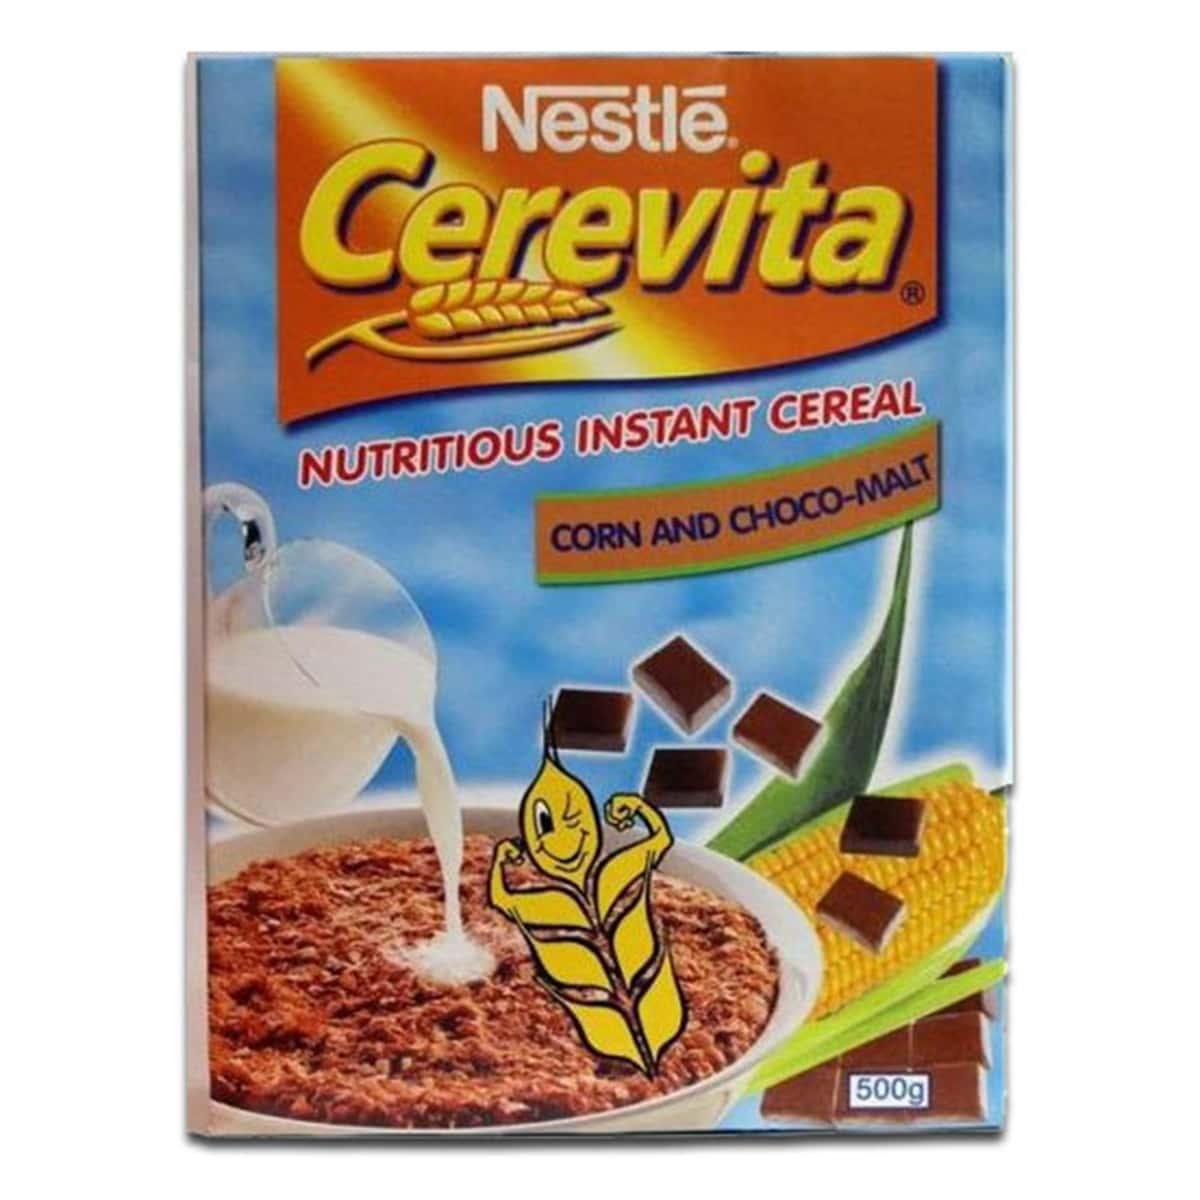 Buy Nestle Cerevita Instant Cereal Corn and Choco Malt - 500 gm